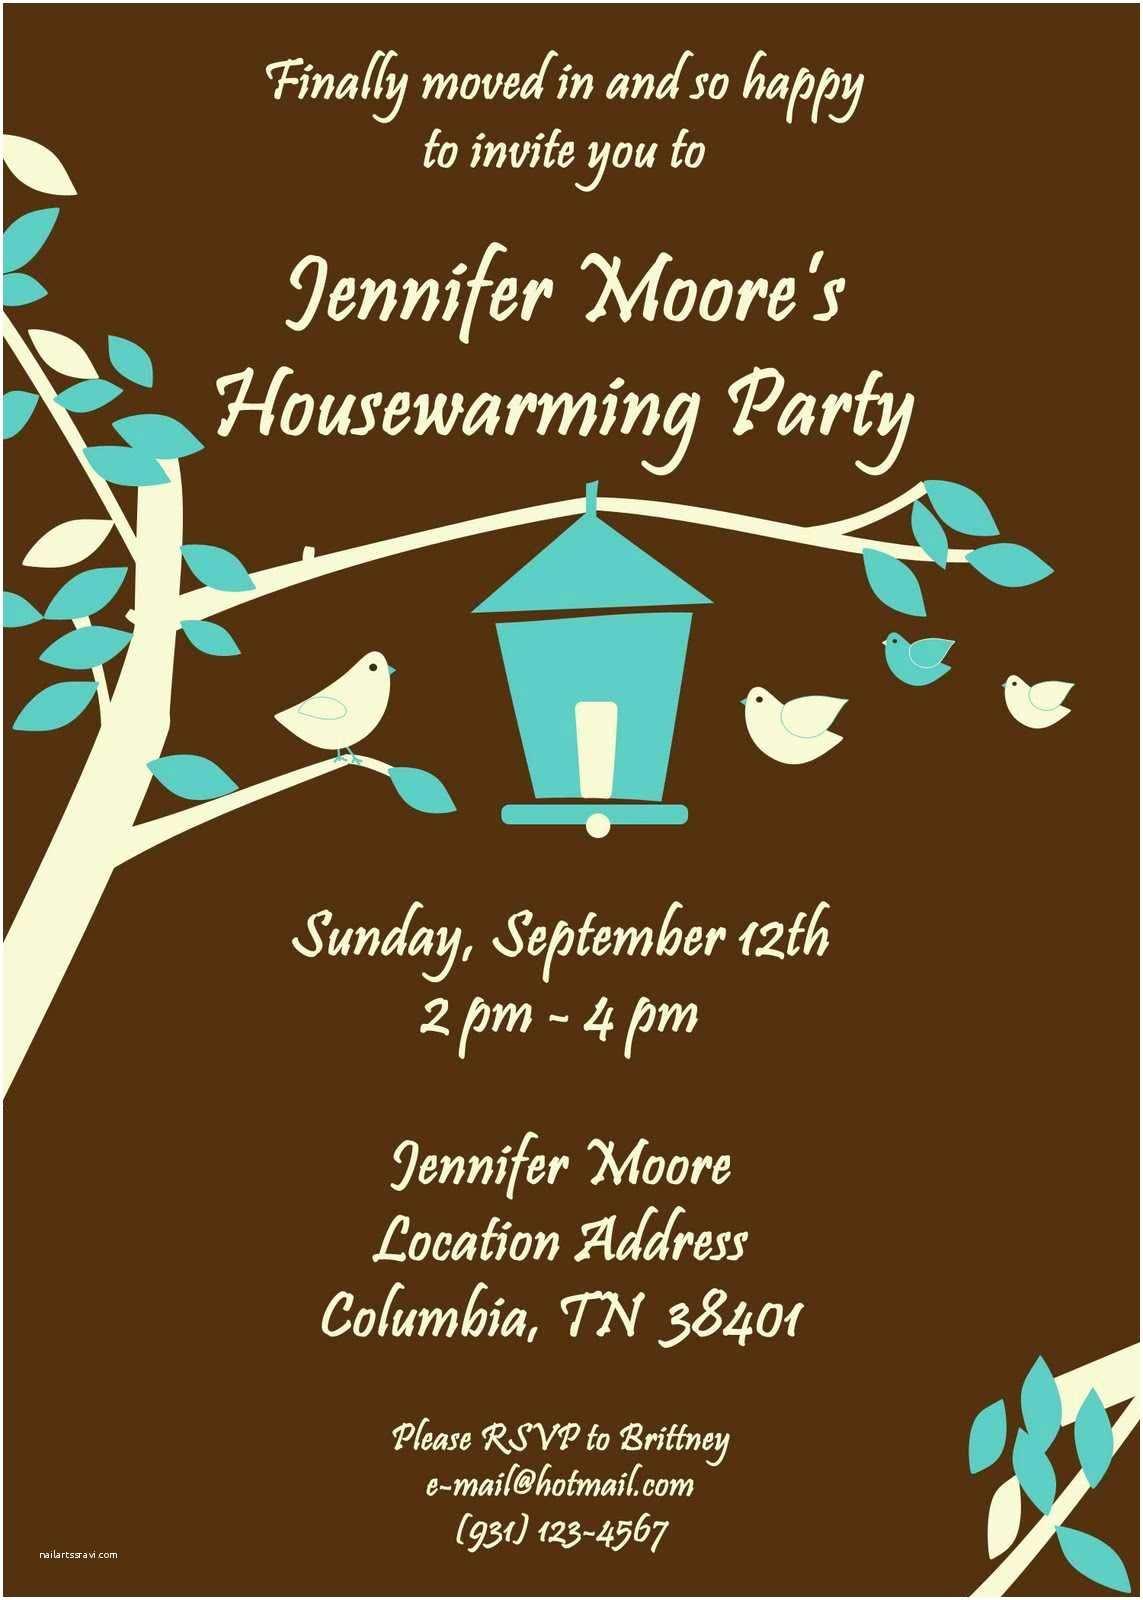 /housewarming/housewarming S Free Birthday Housewarming